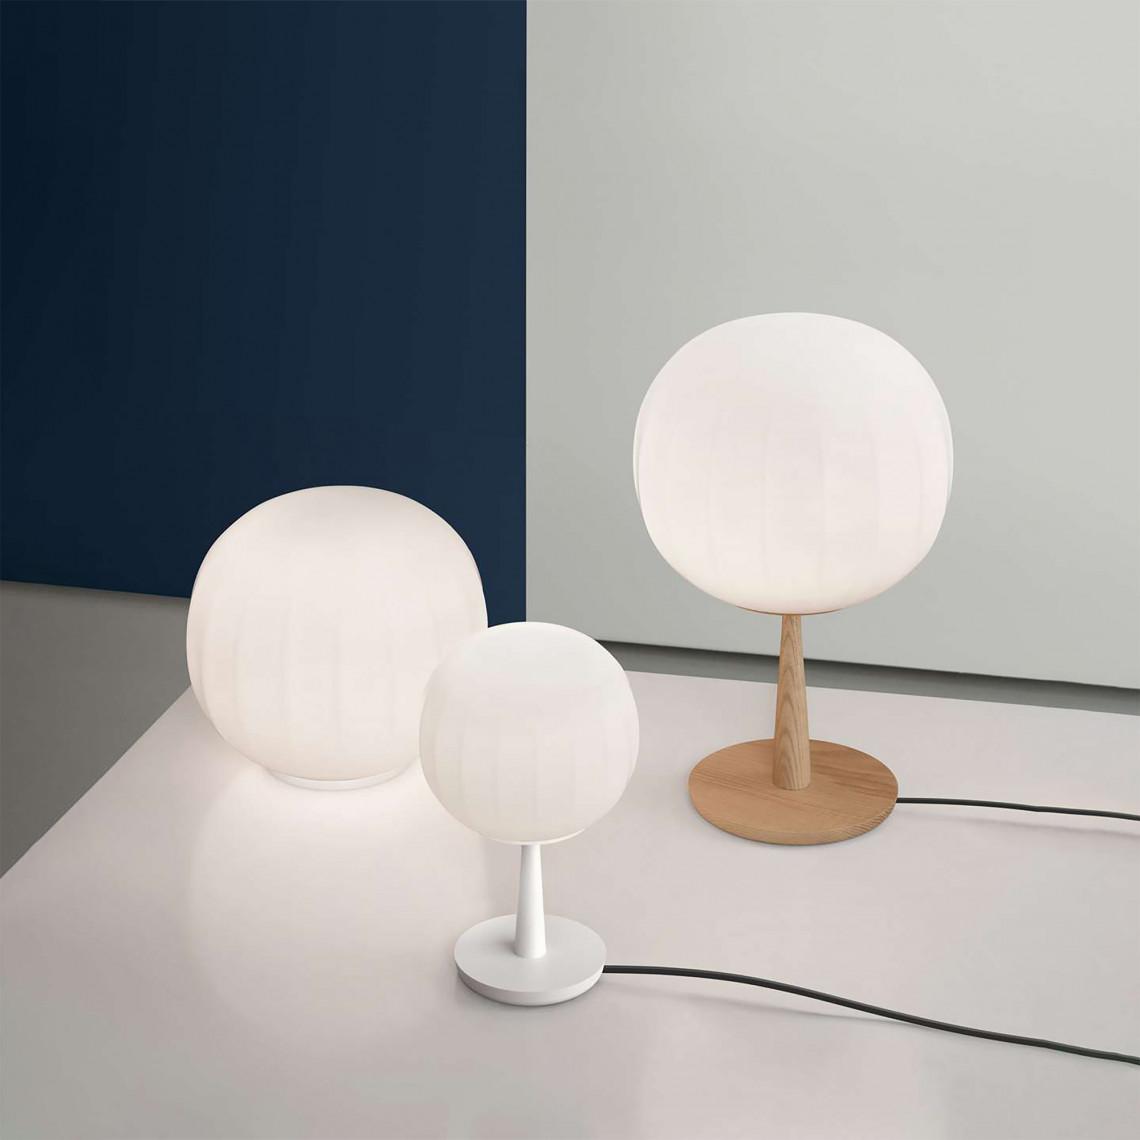 Bordslampa Lita - 14 cm